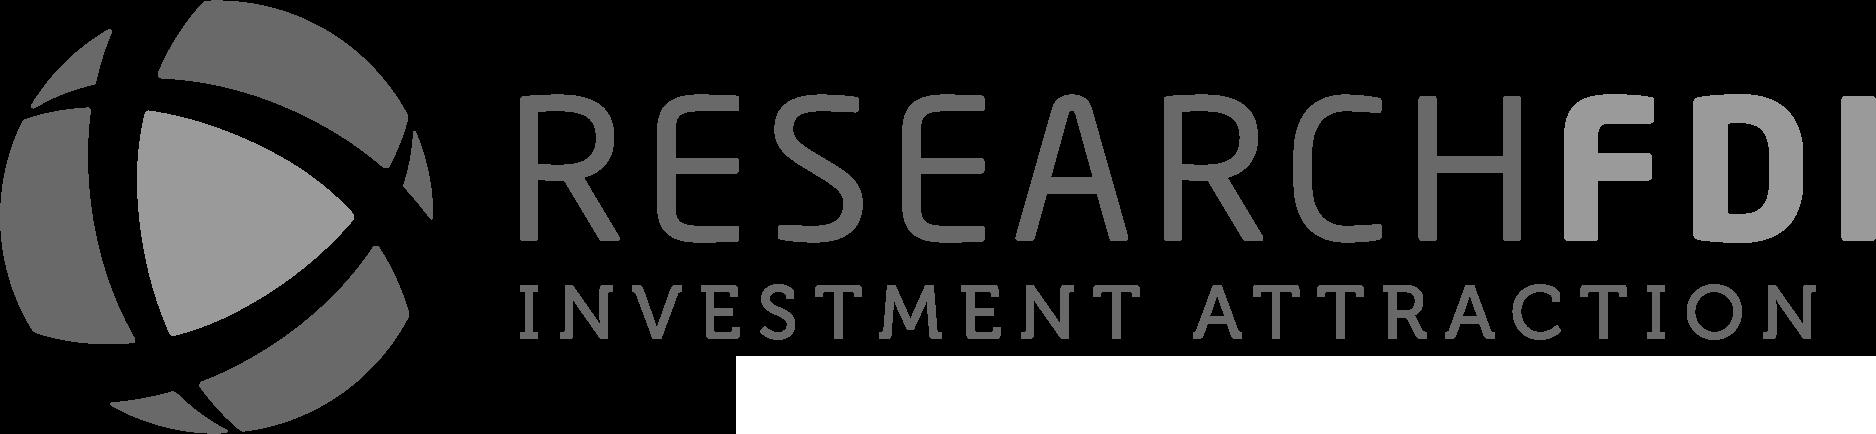 Investor Image